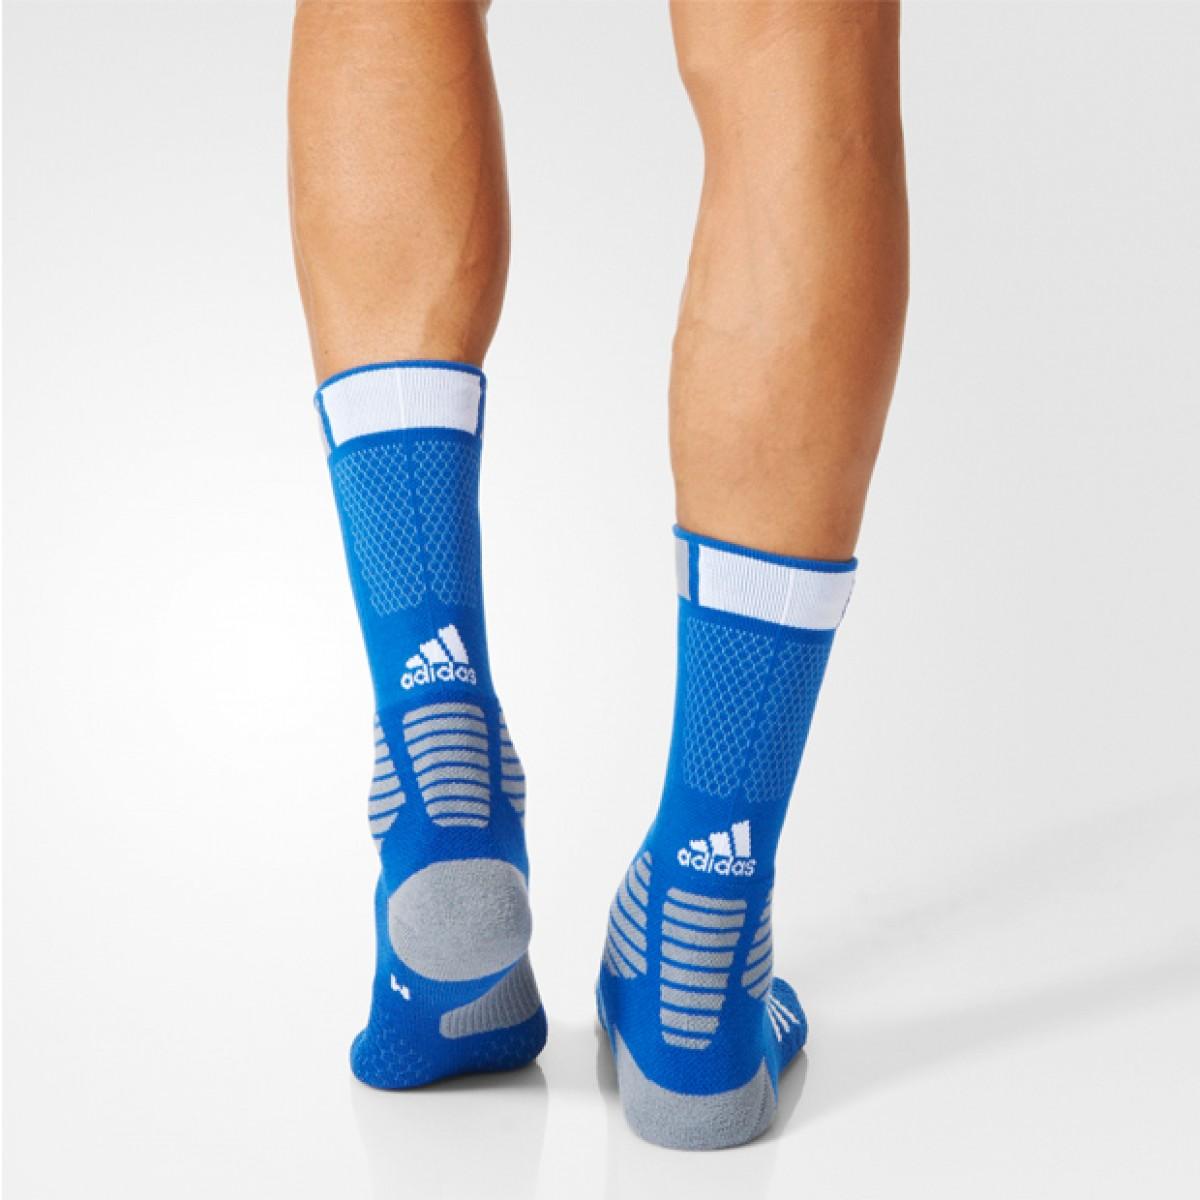 Adidas Crew Socks 'Blue' AO0517